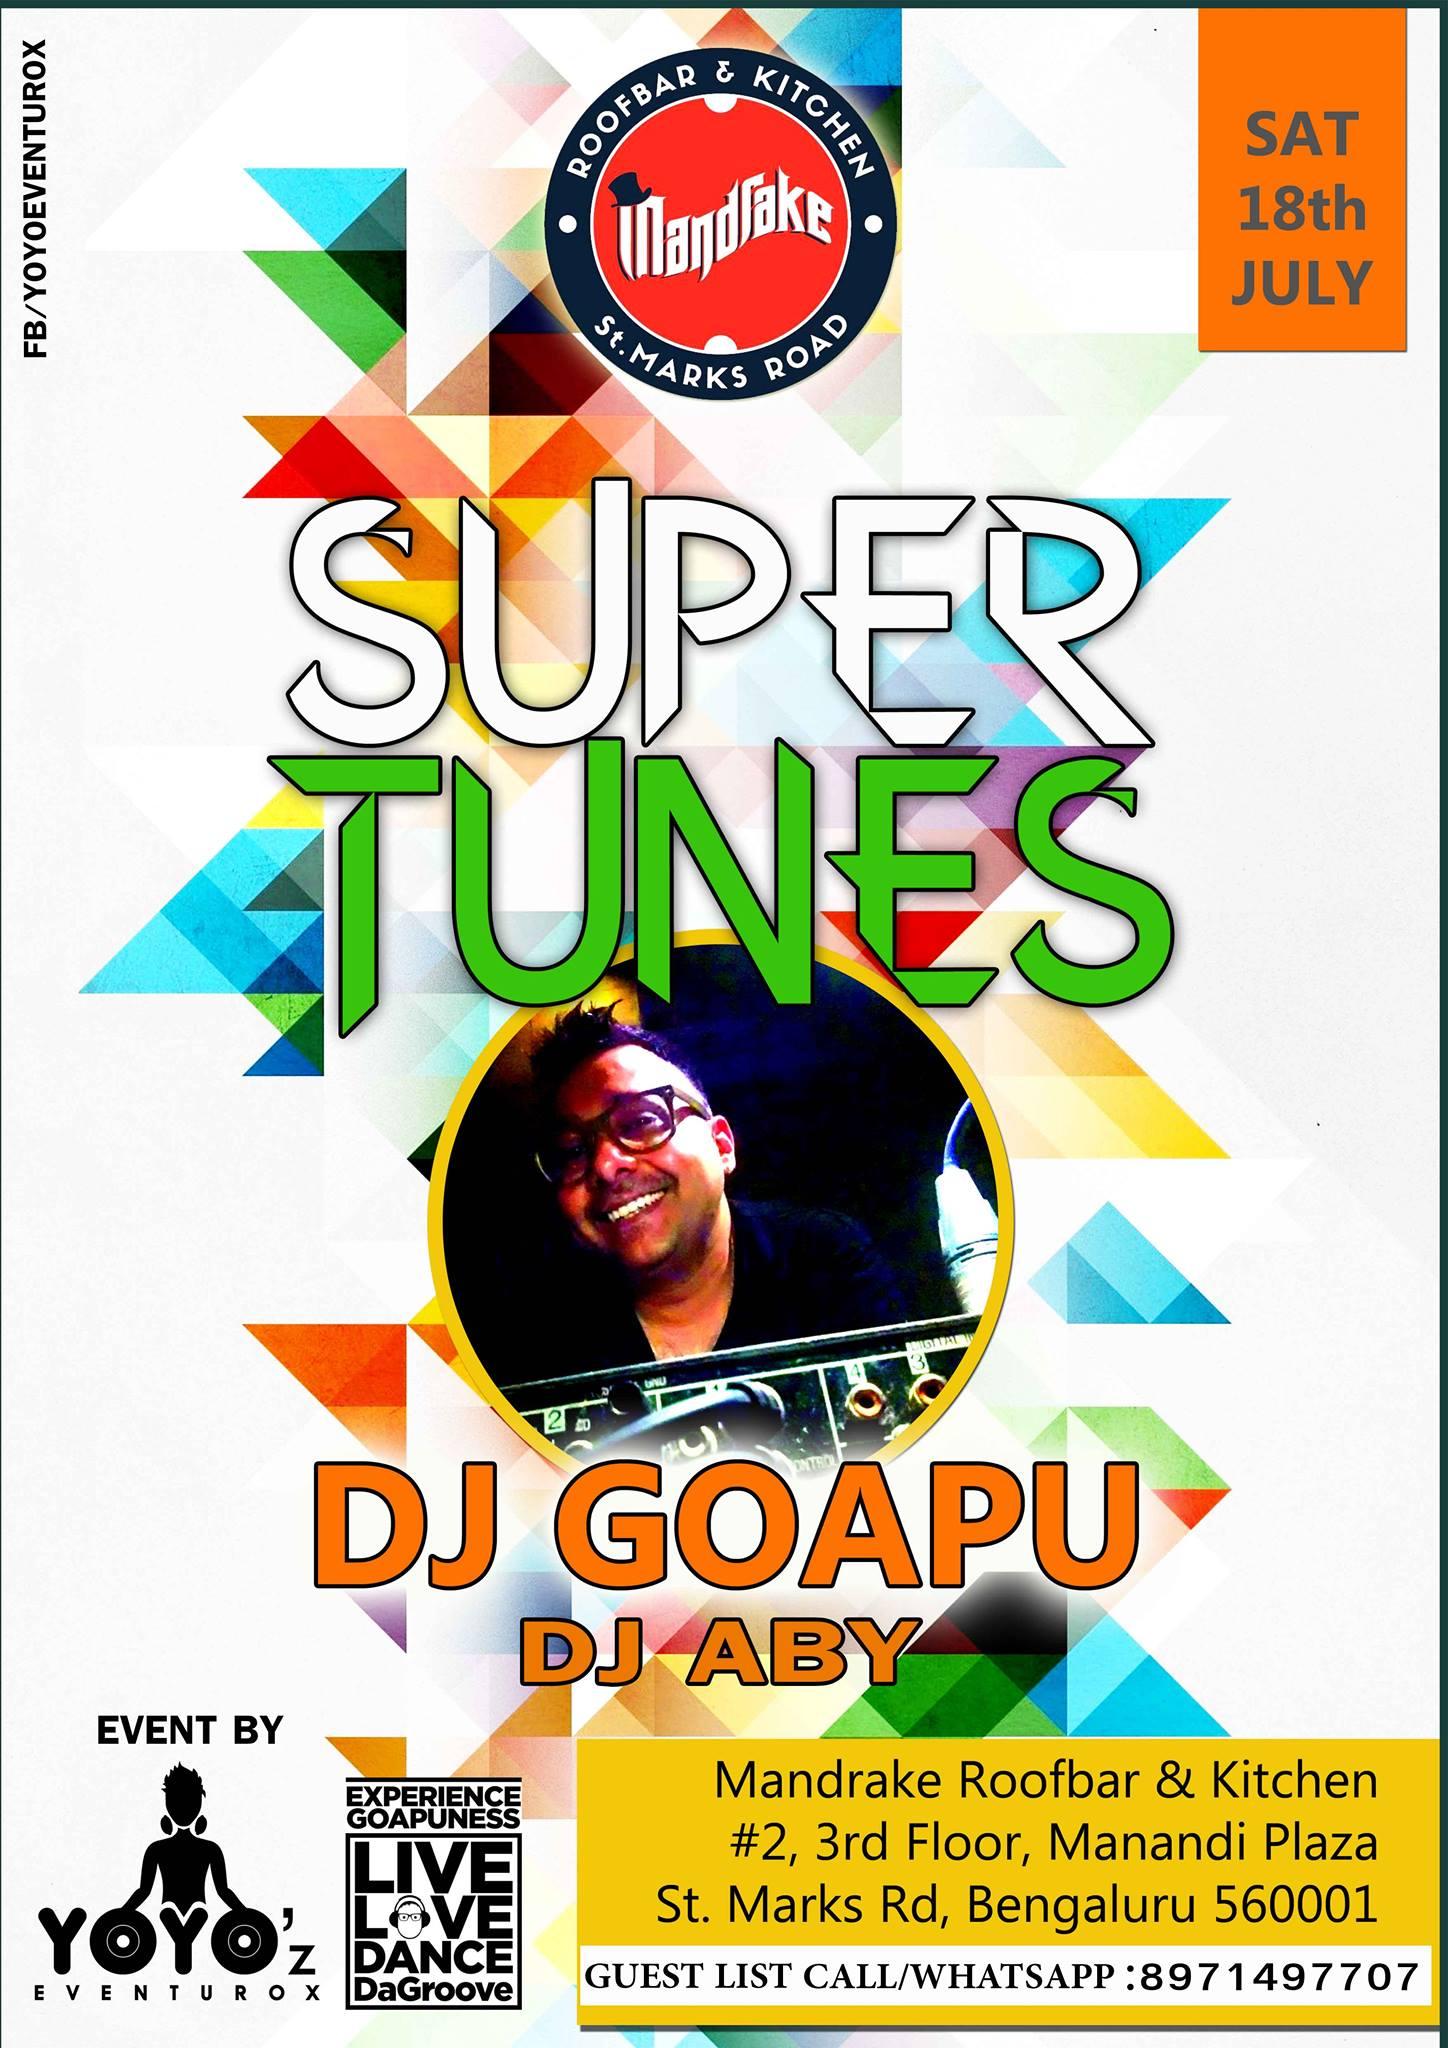 Super Tunes Live With DJ Goapu,DJ Aby @Mandrake roofbar RSVP : 8971497707